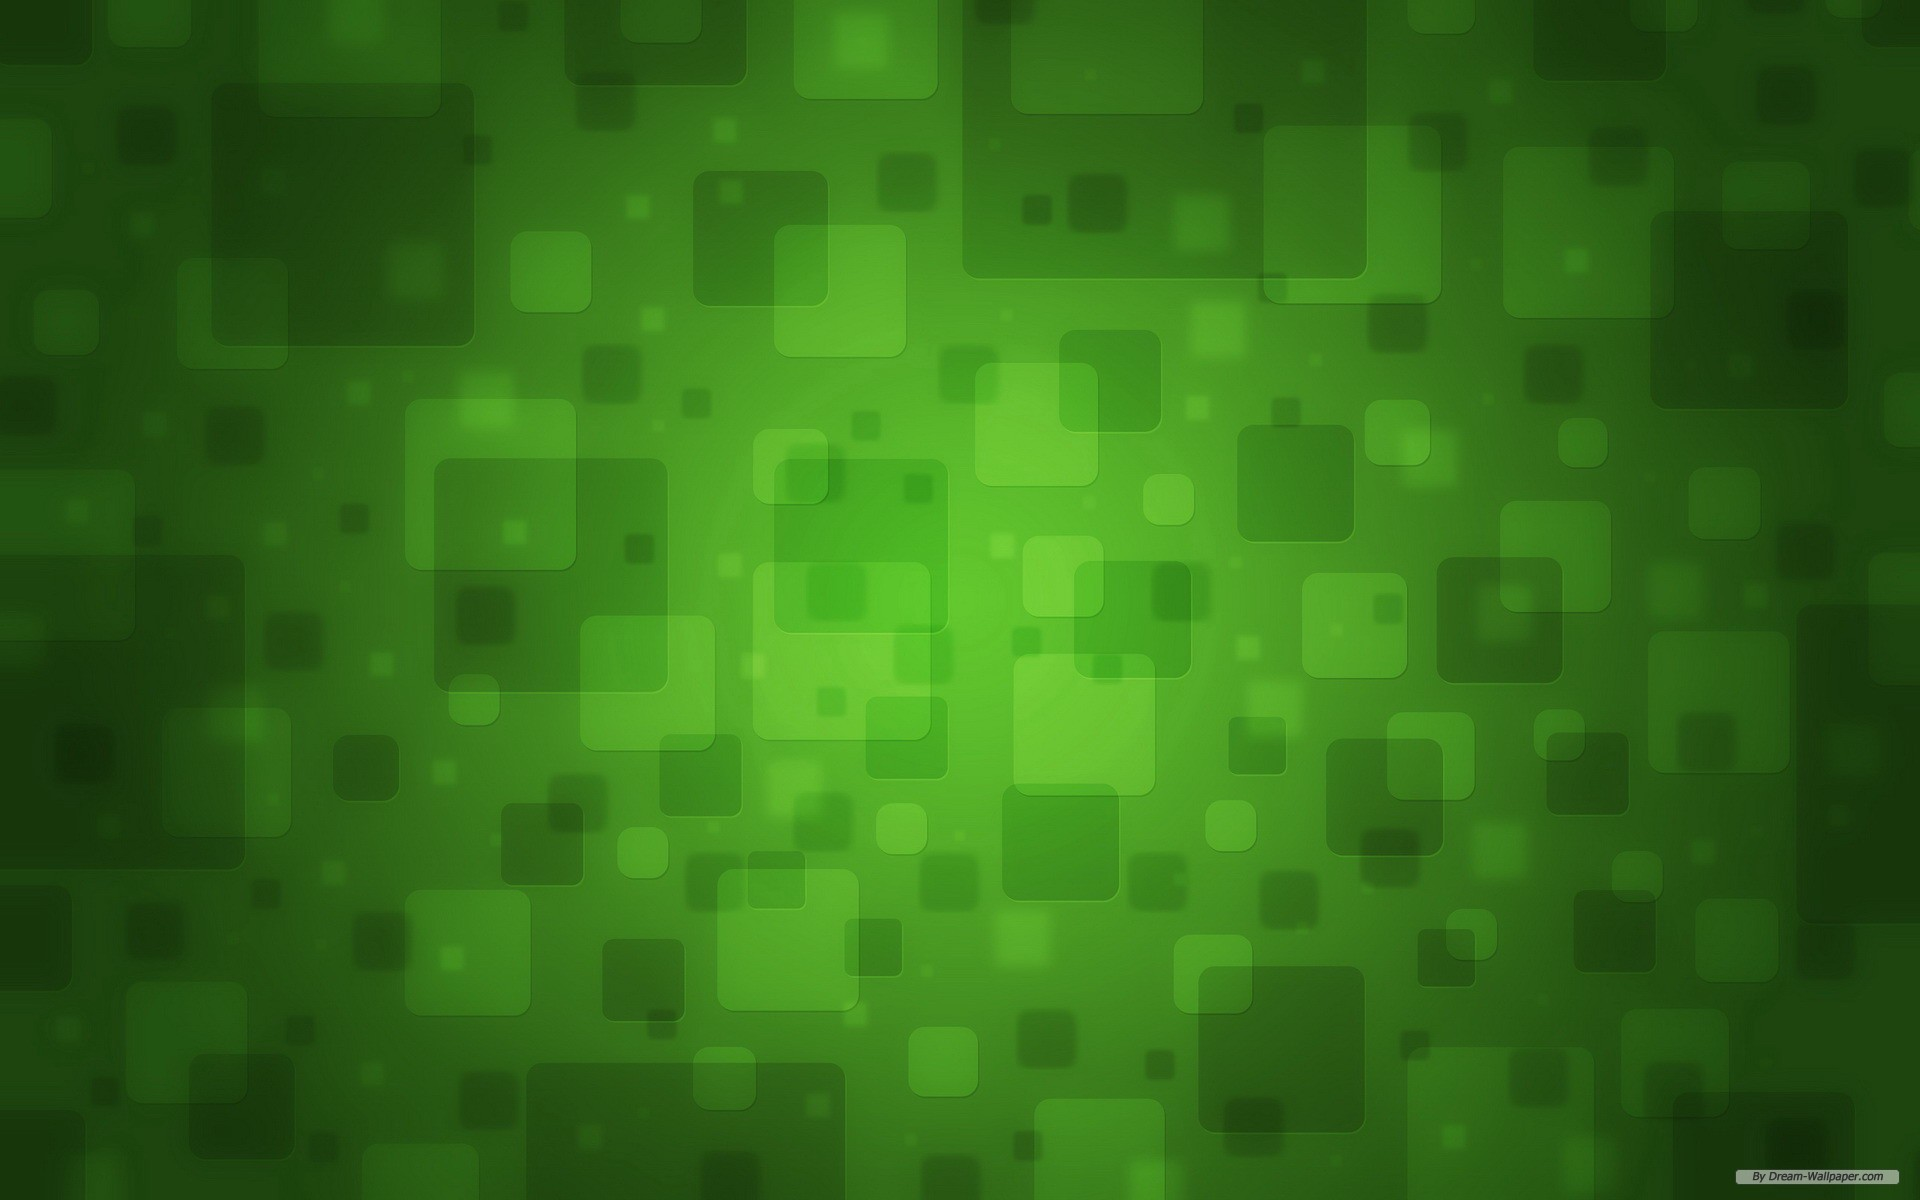 Green Background Wallpaper Design